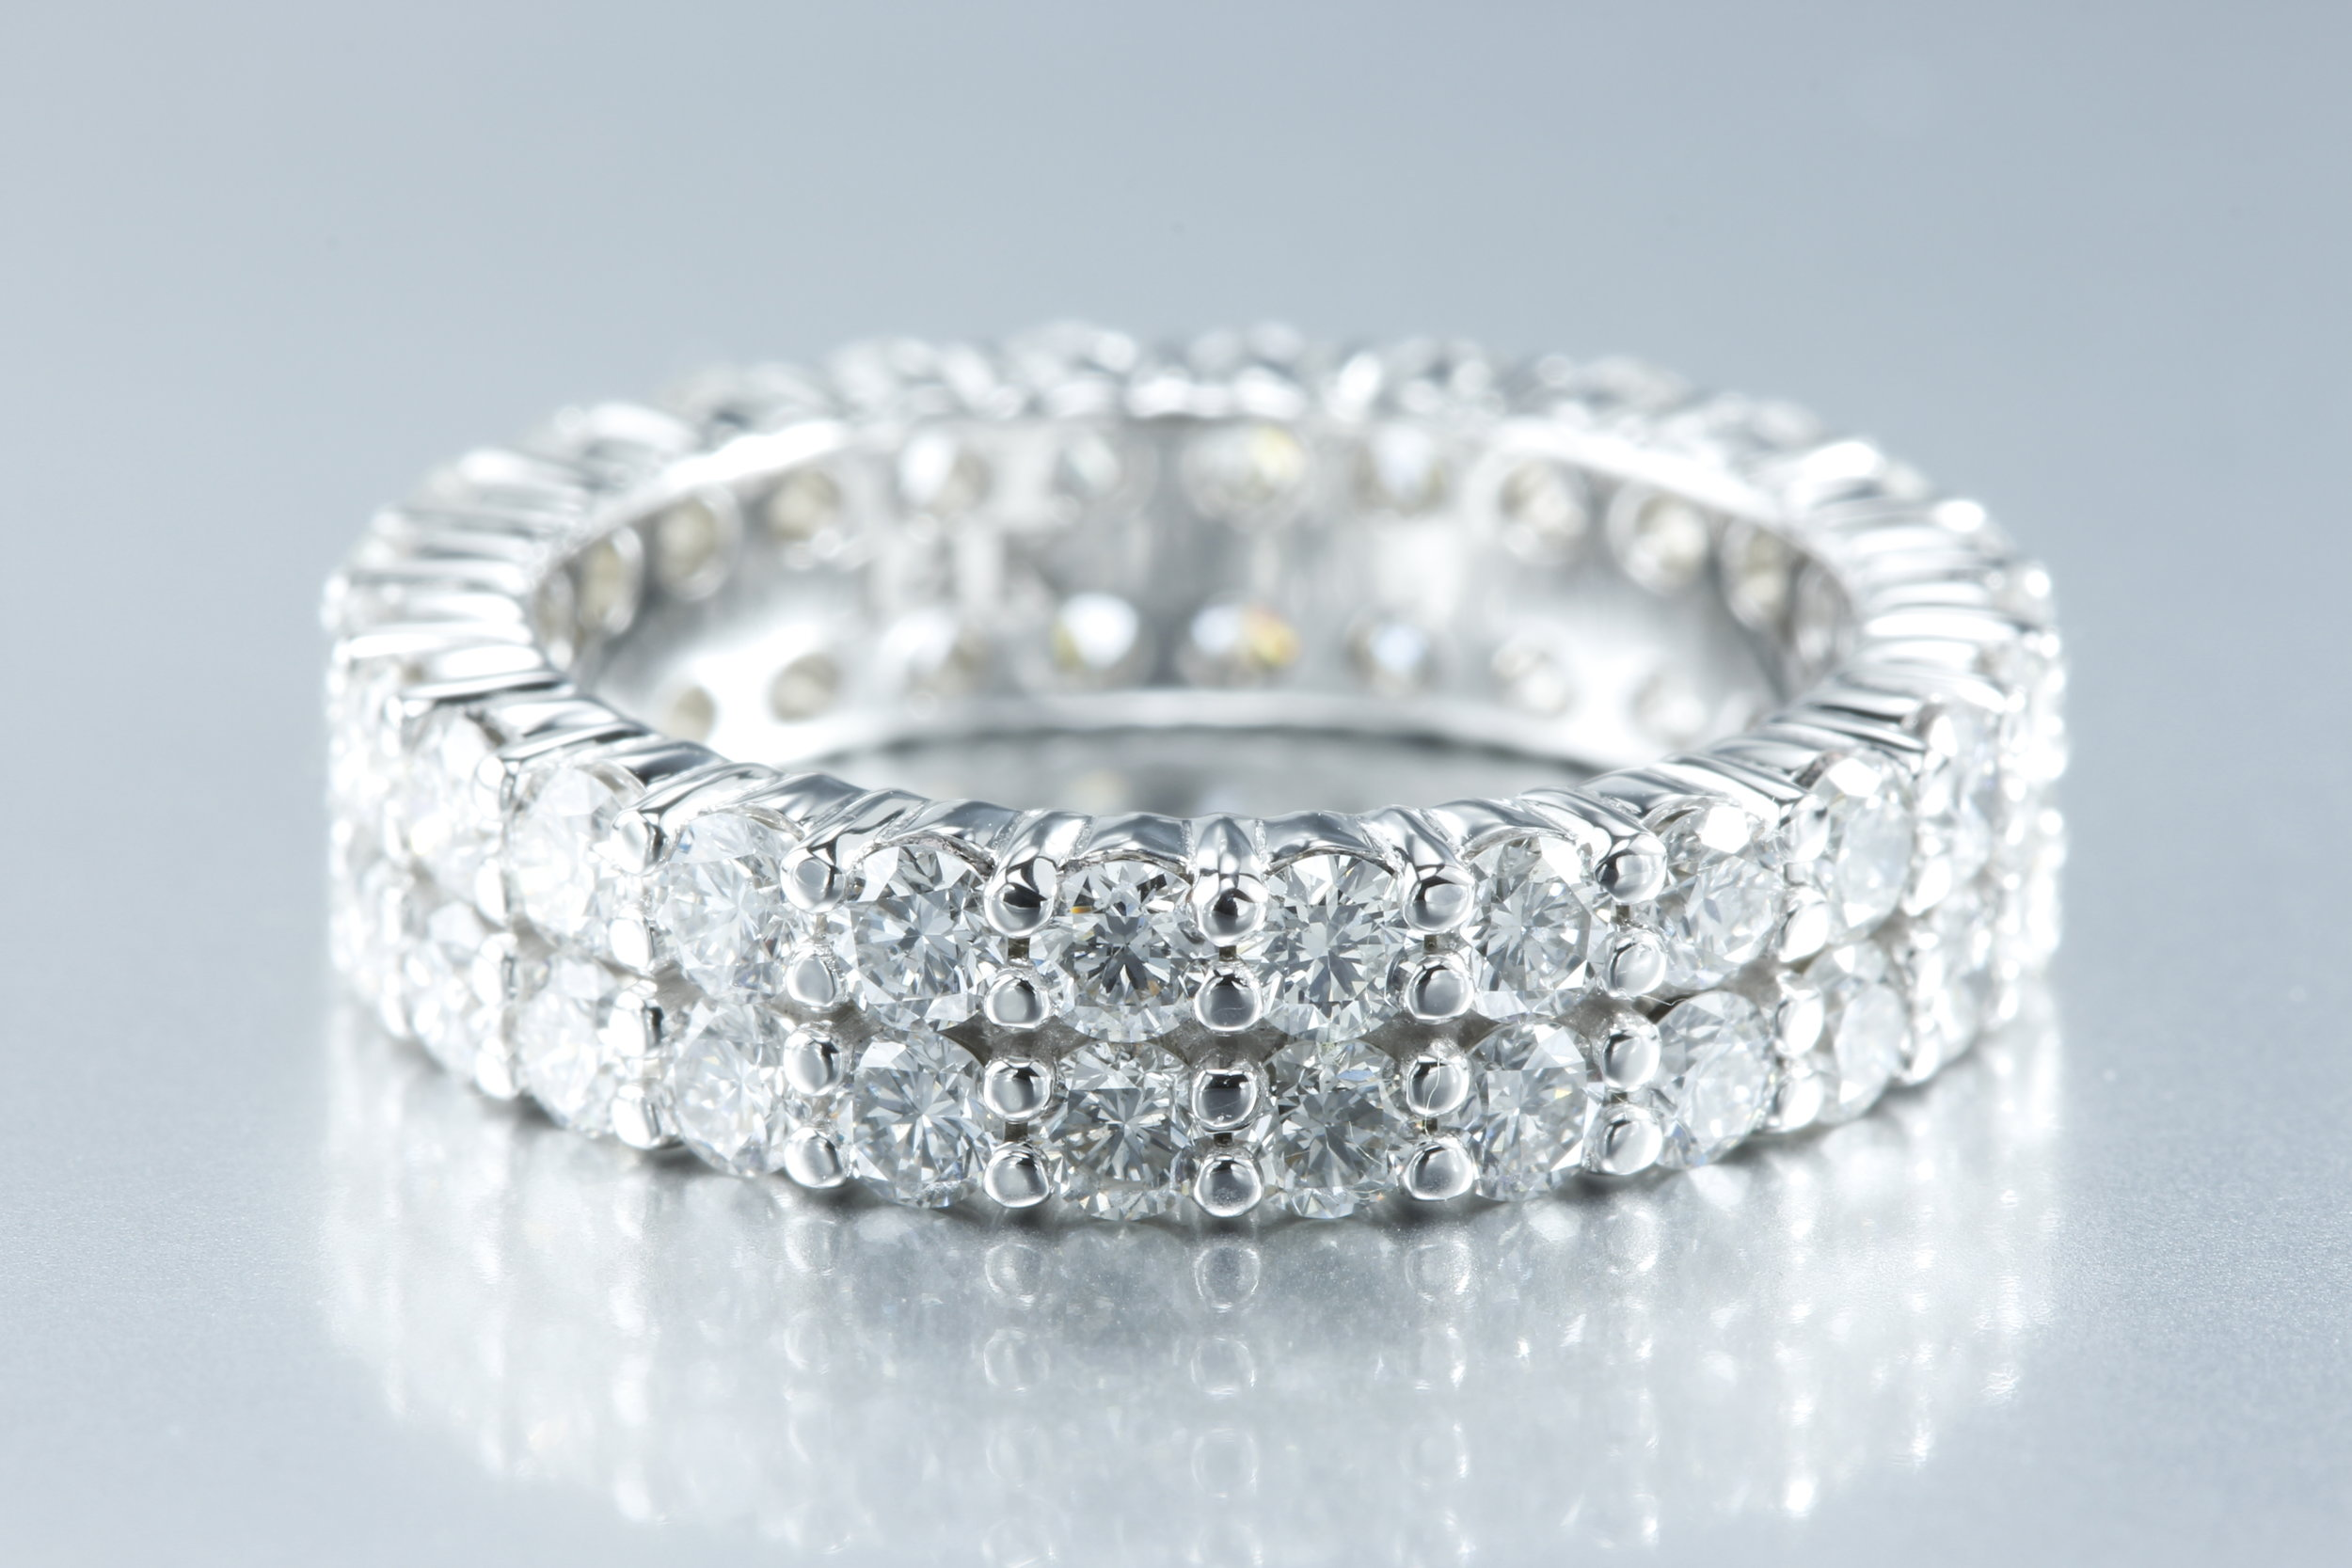 Double Row Diamond Ring - Genuine diamonds around both bands in platinum.